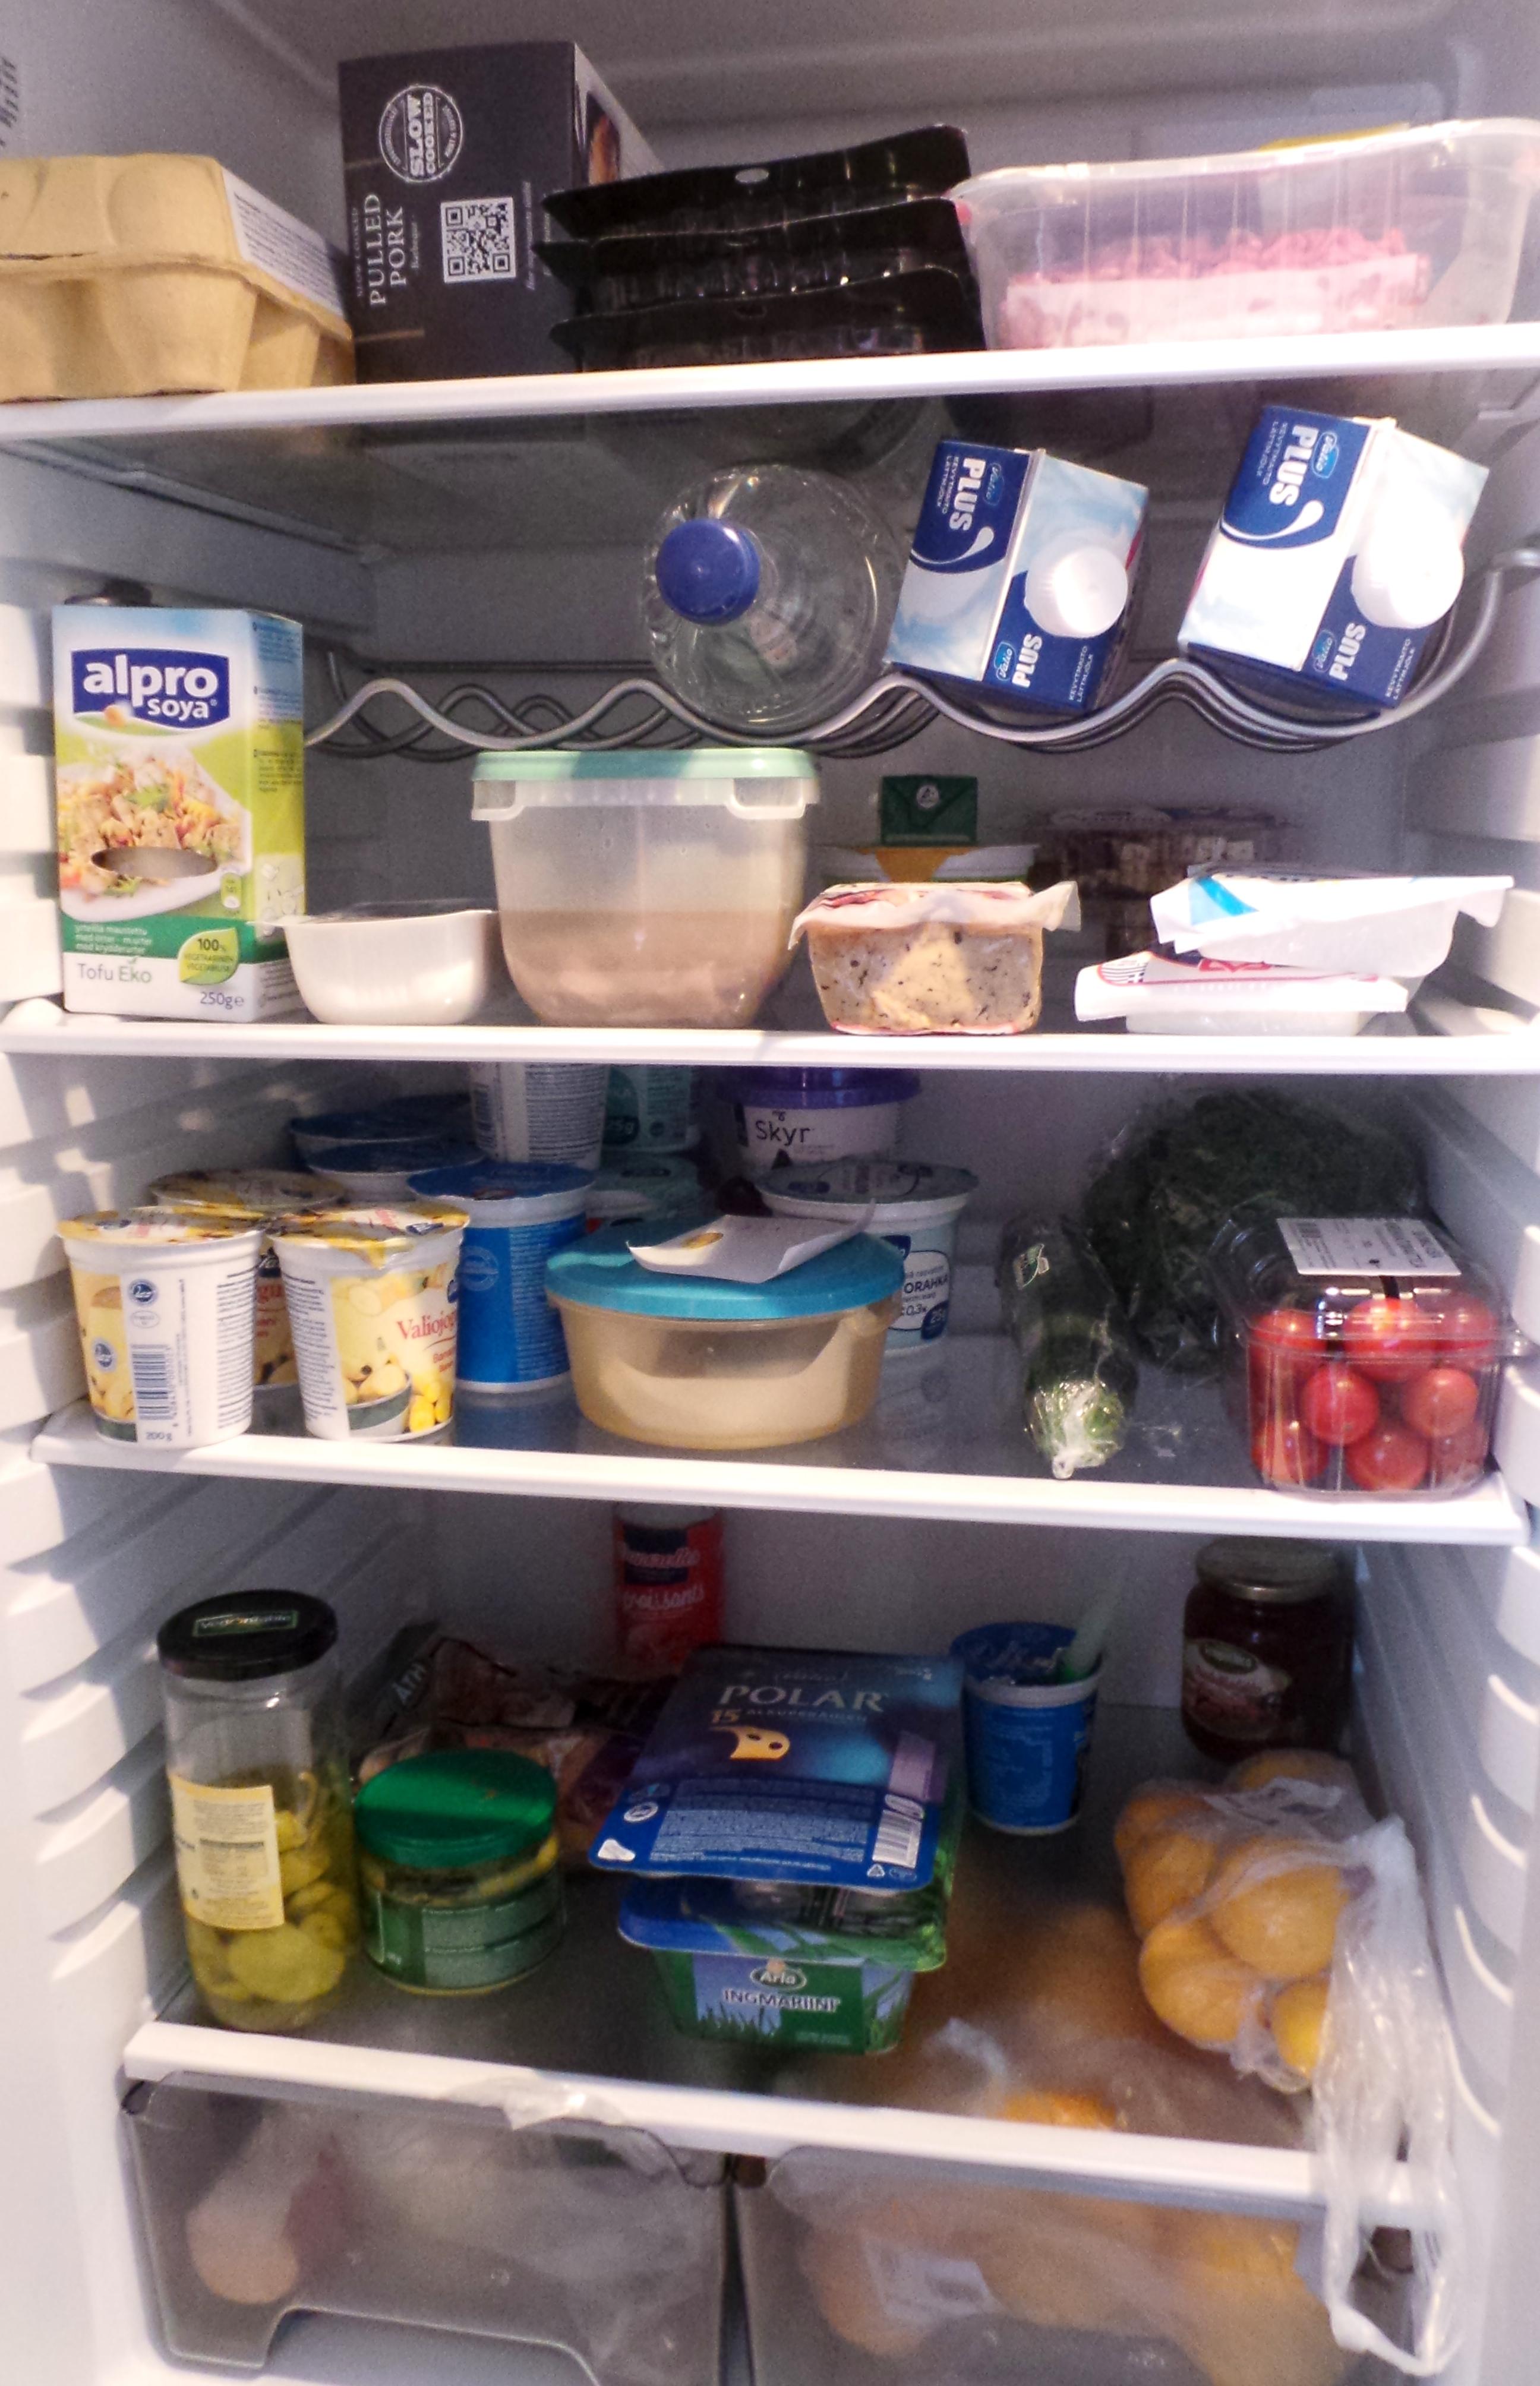 Kurkistus jääkaappiin (ja haaste)